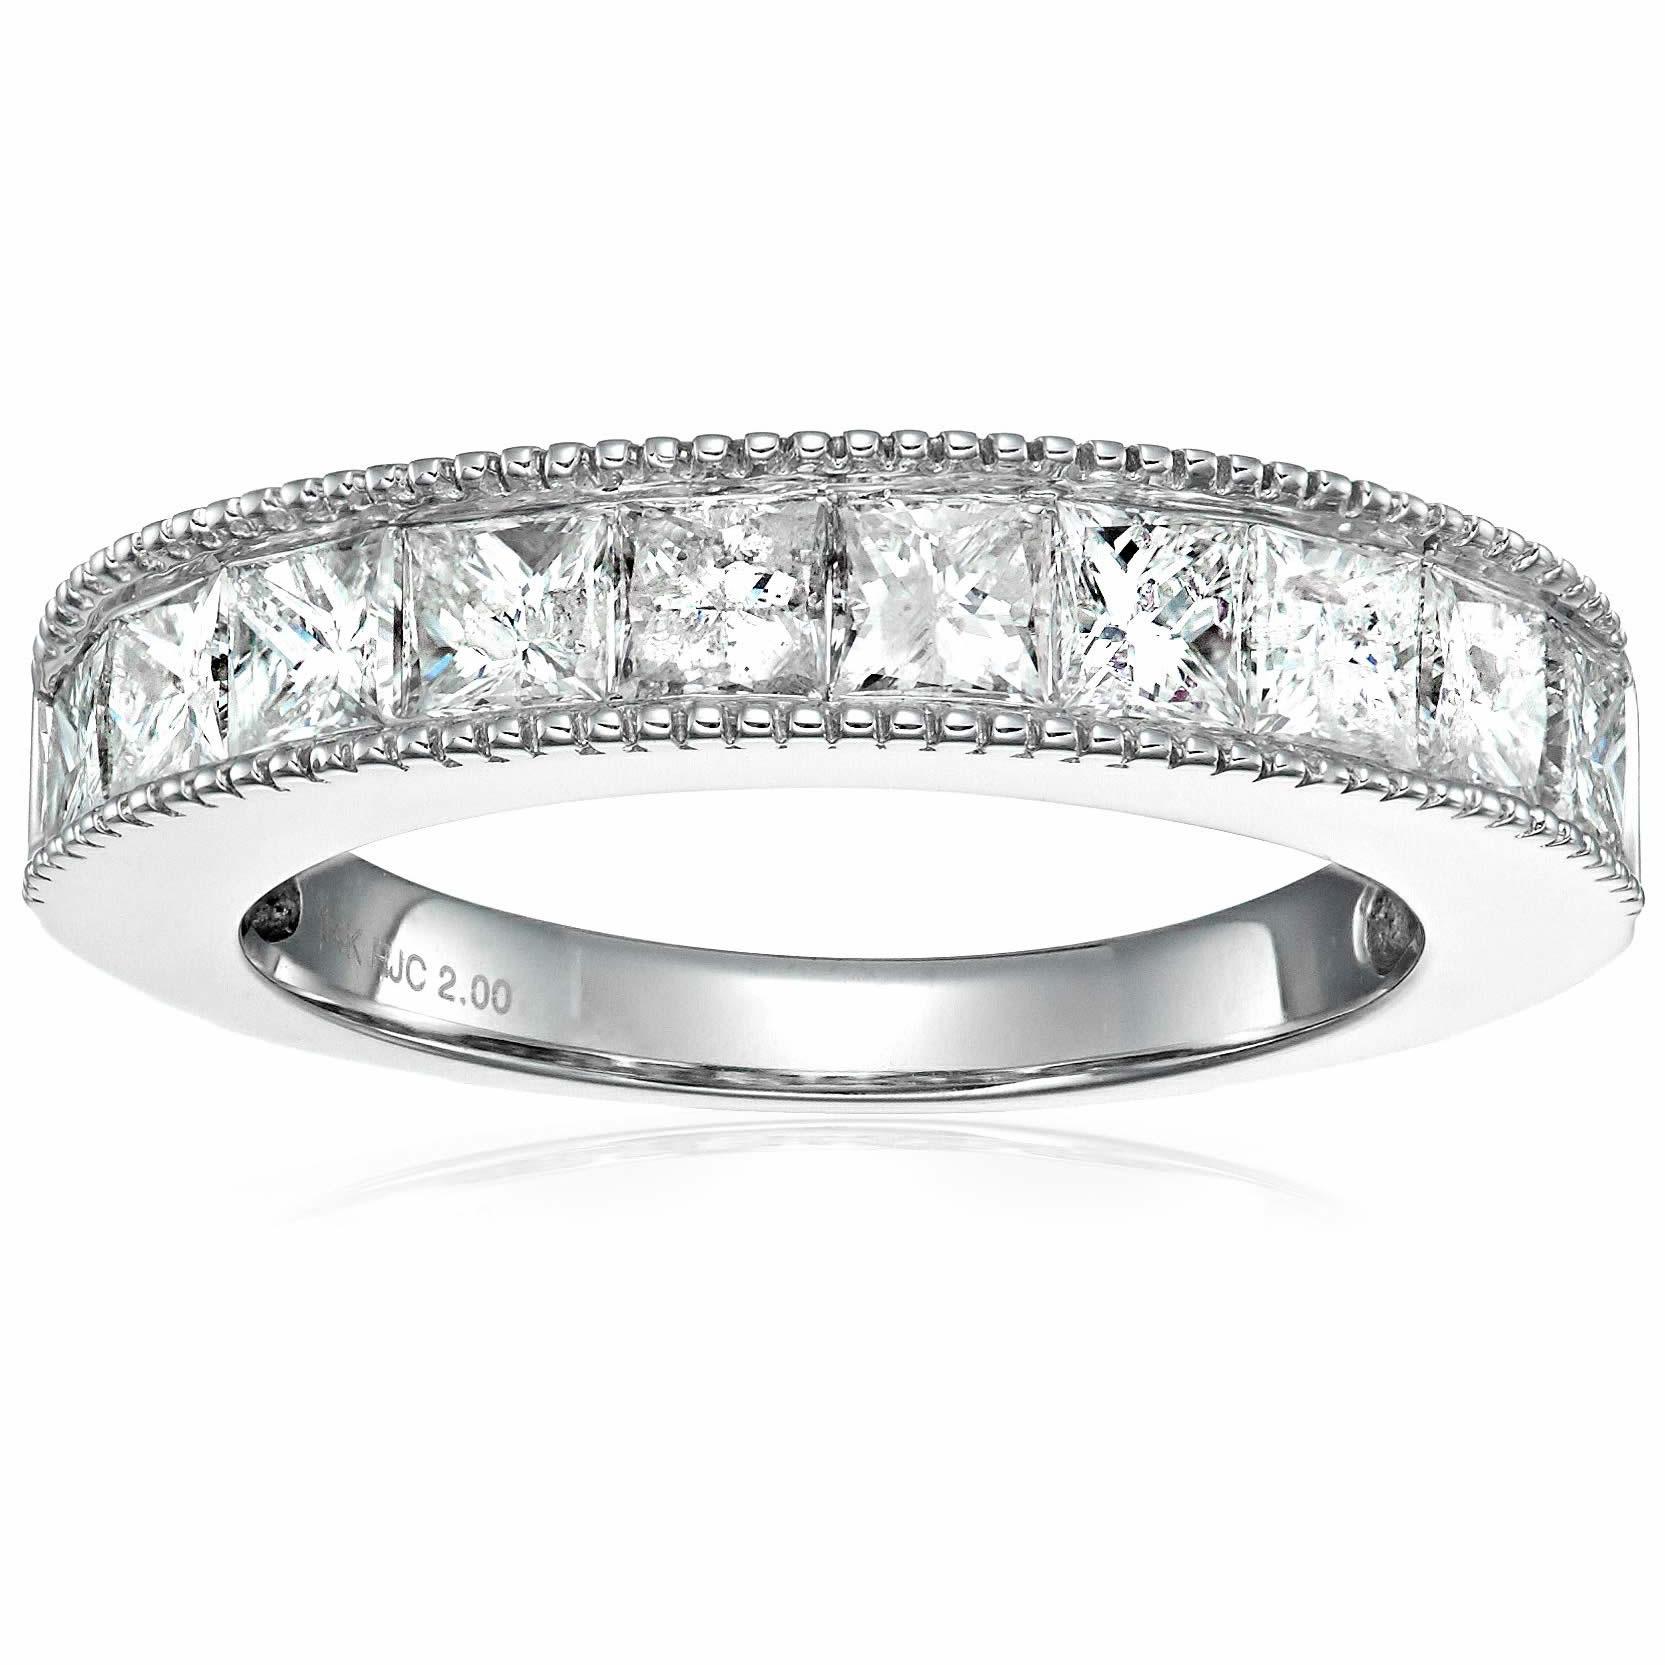 14k White Gold 3.5 CT Princess Cut Diamond Engagement Wedding Milgrain Ring